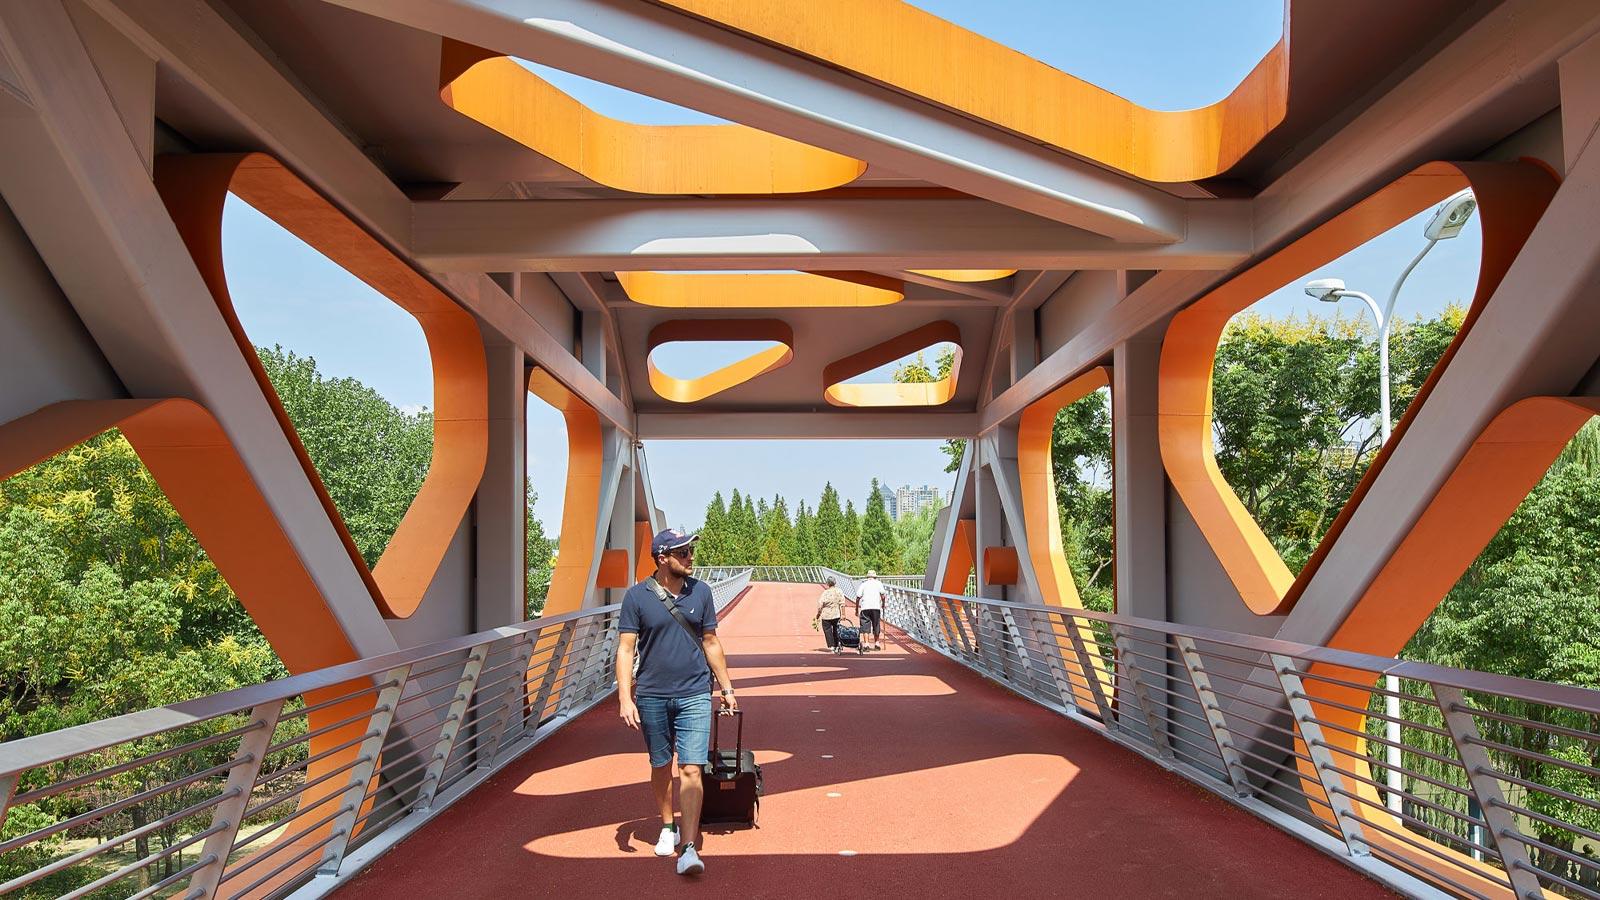 Jiangyin Greenway bridge